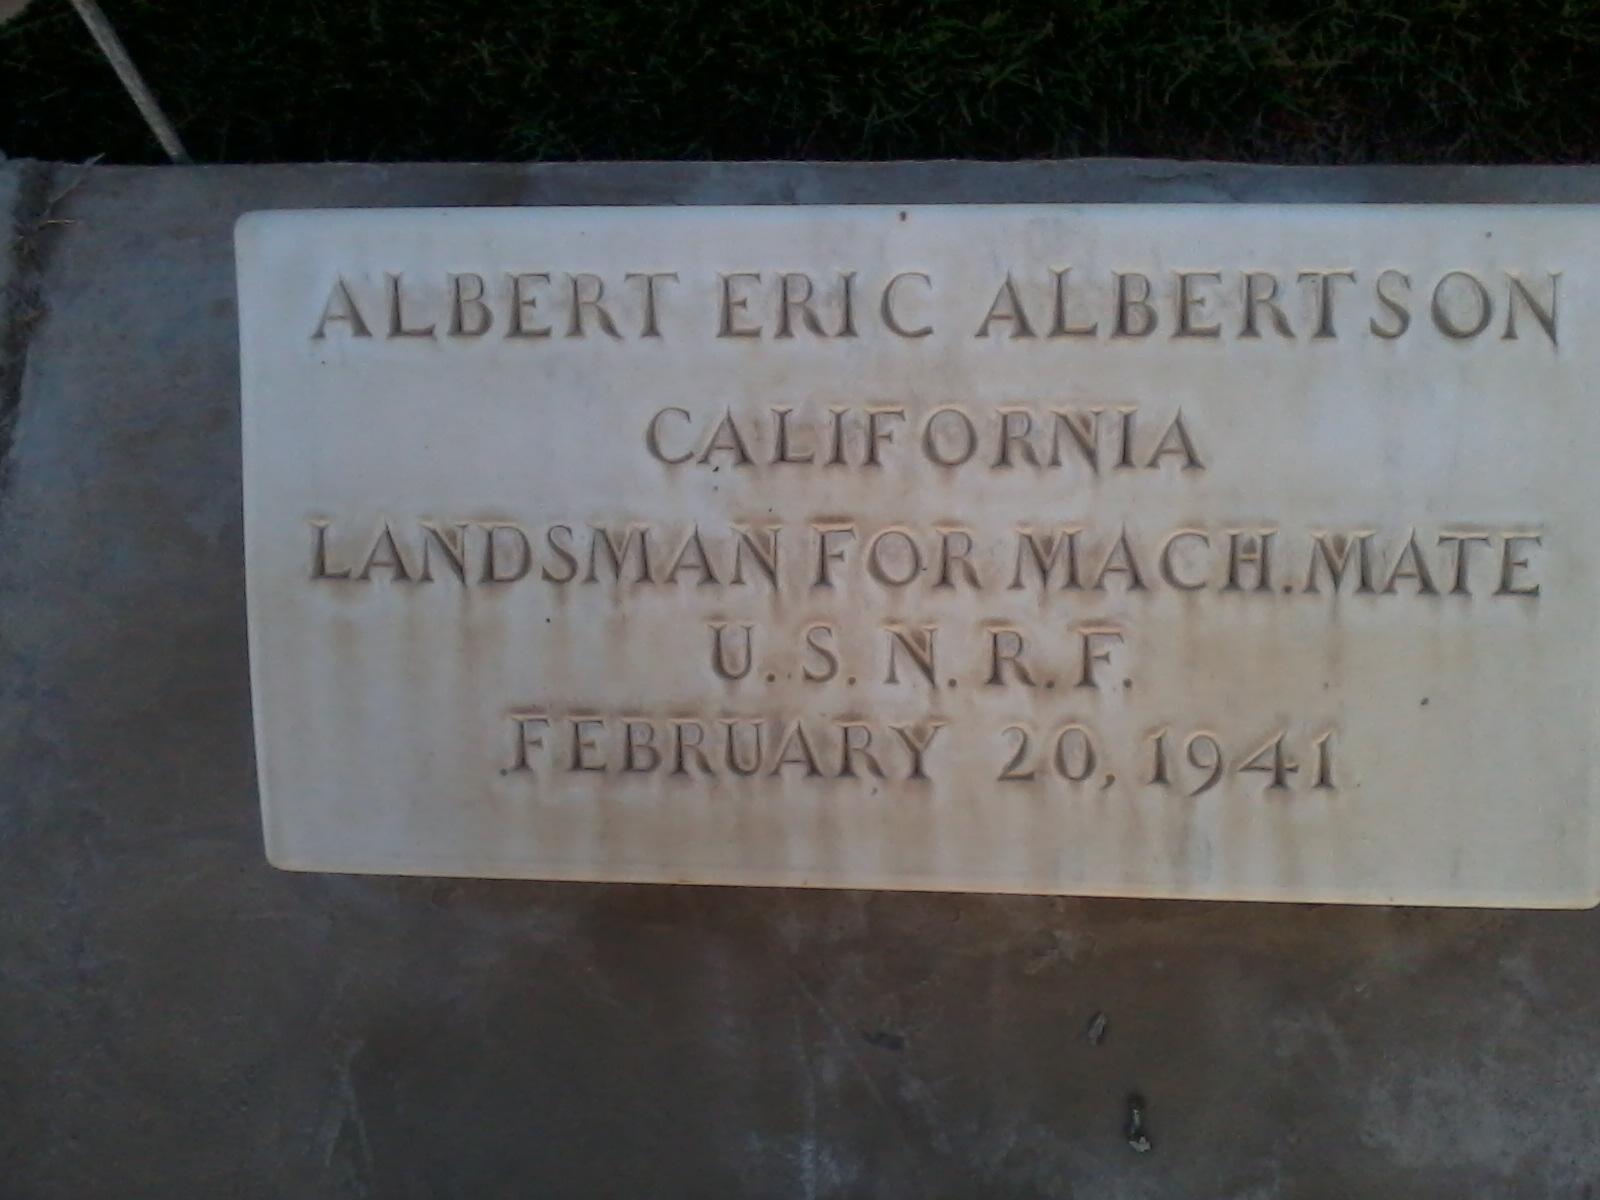 Albert Eric Albertson